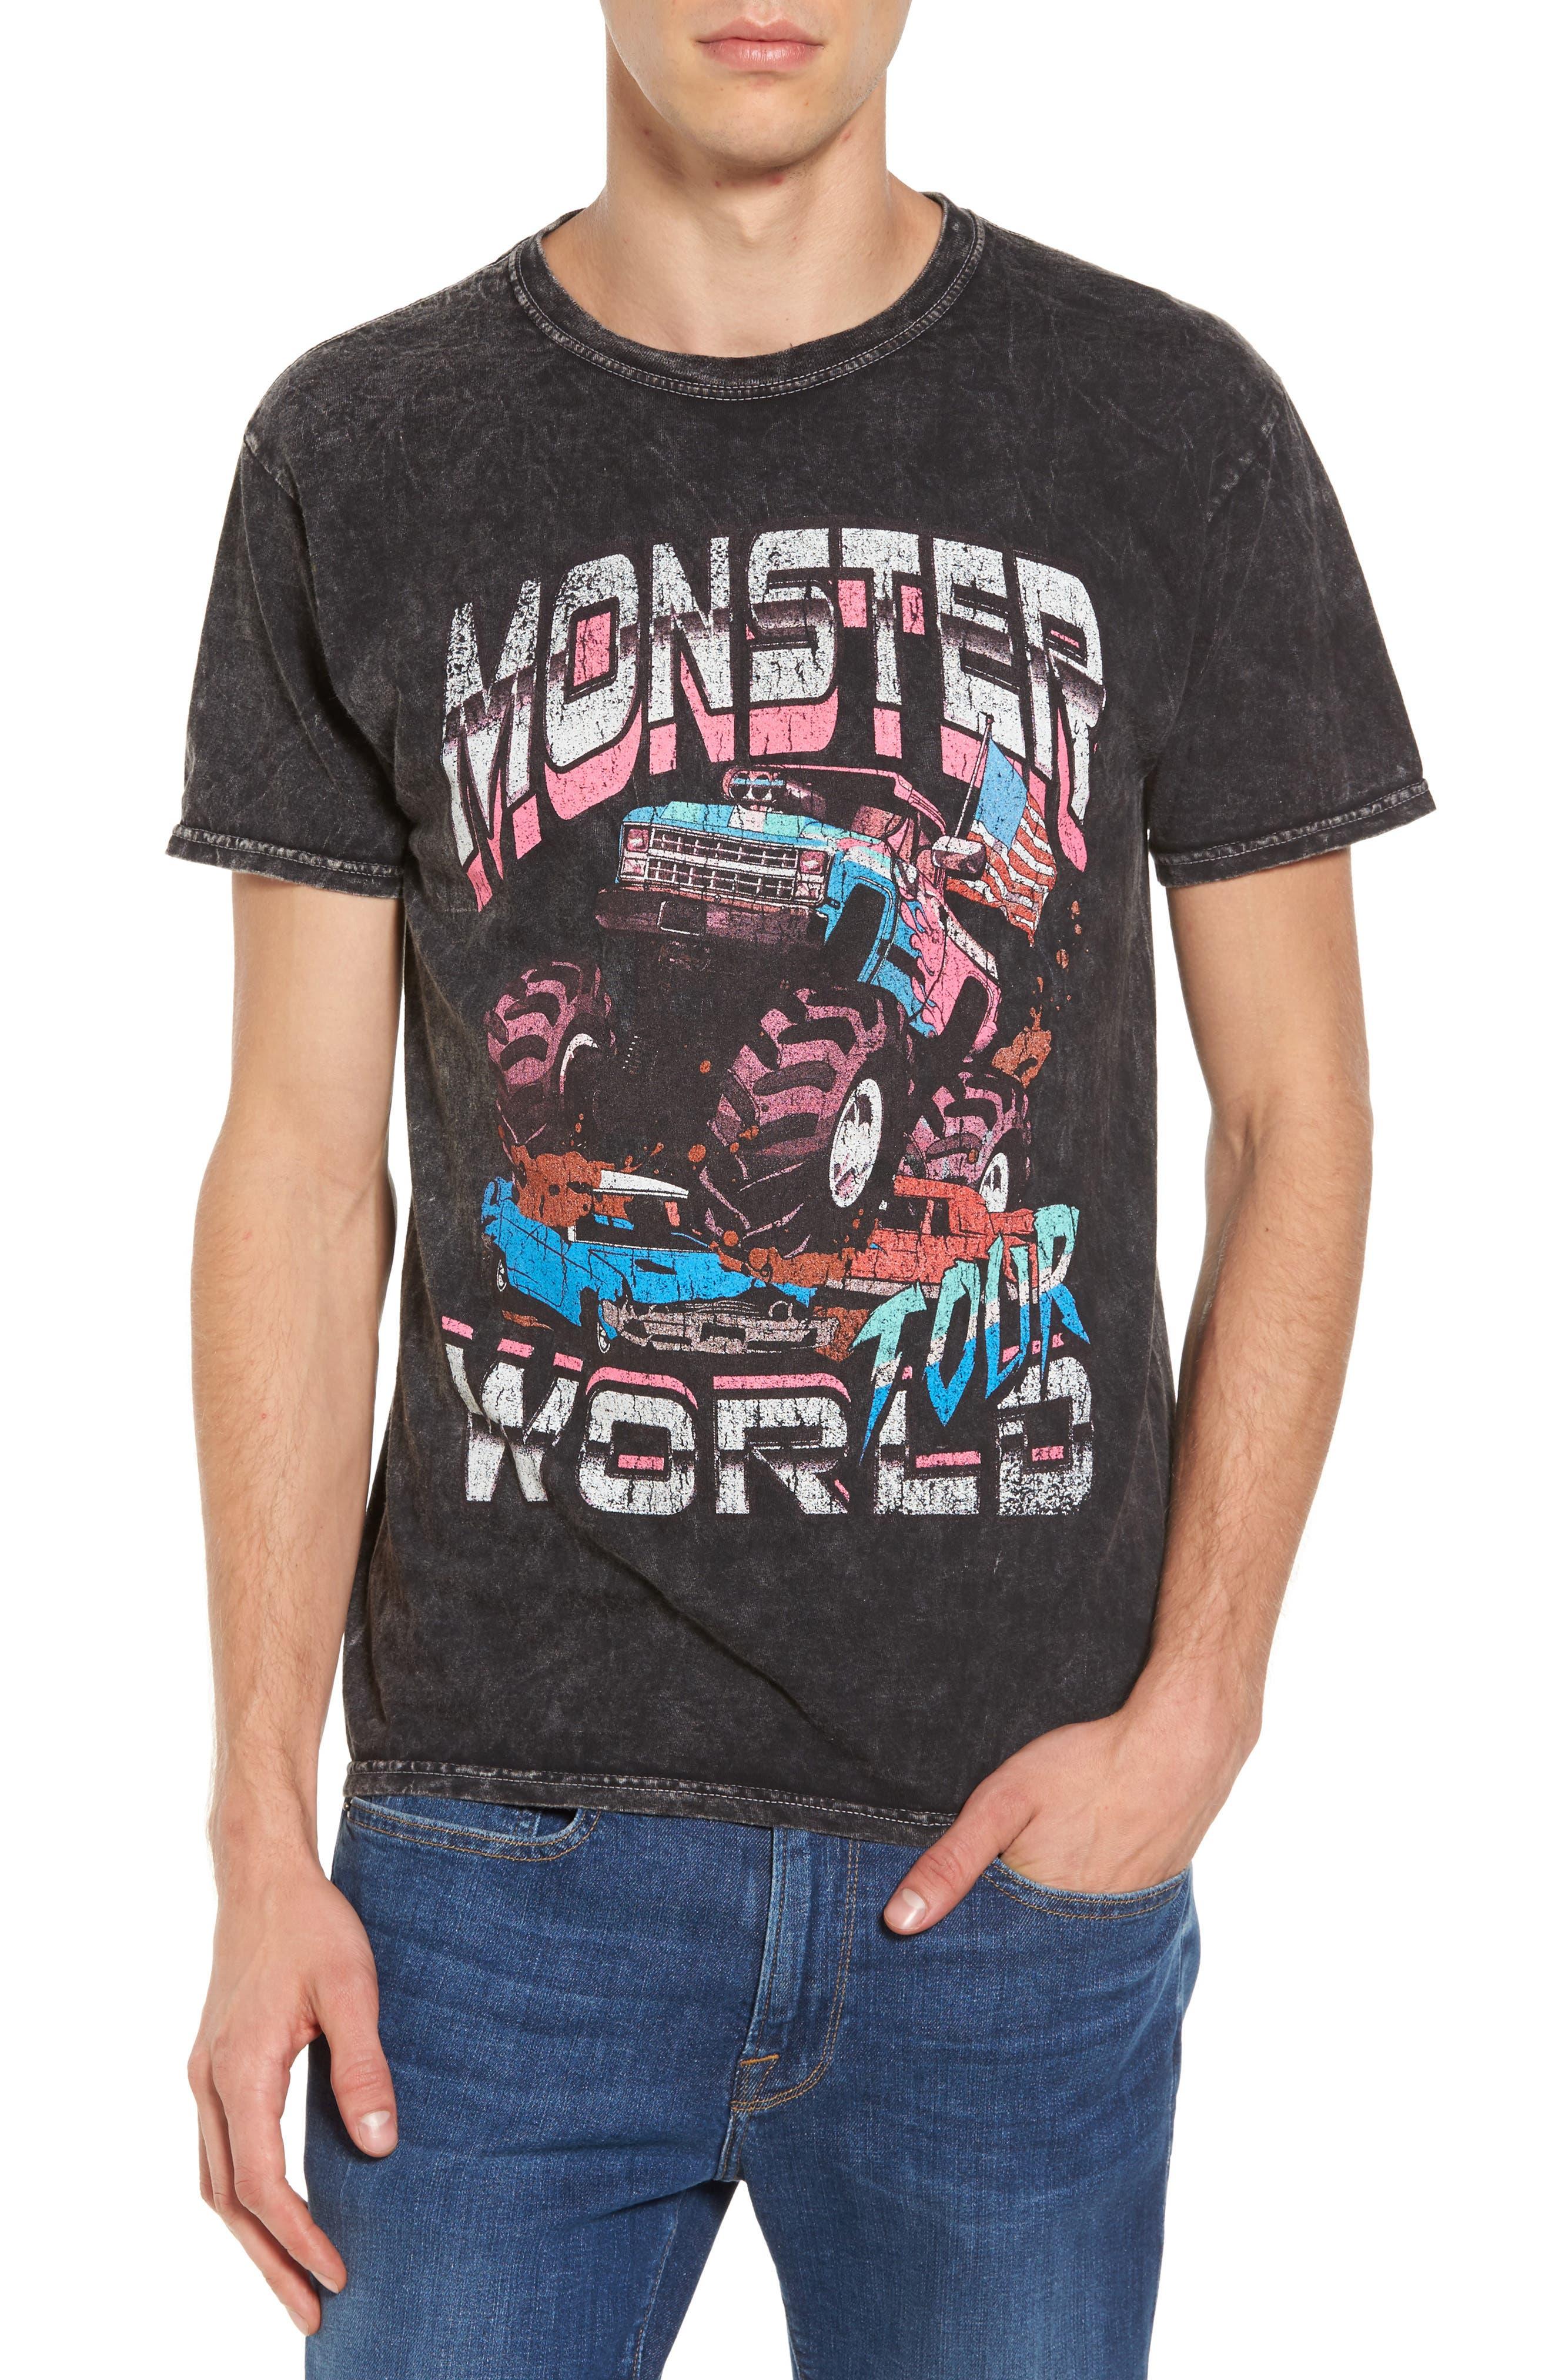 The Rail Monster World Graphic T-Shirt